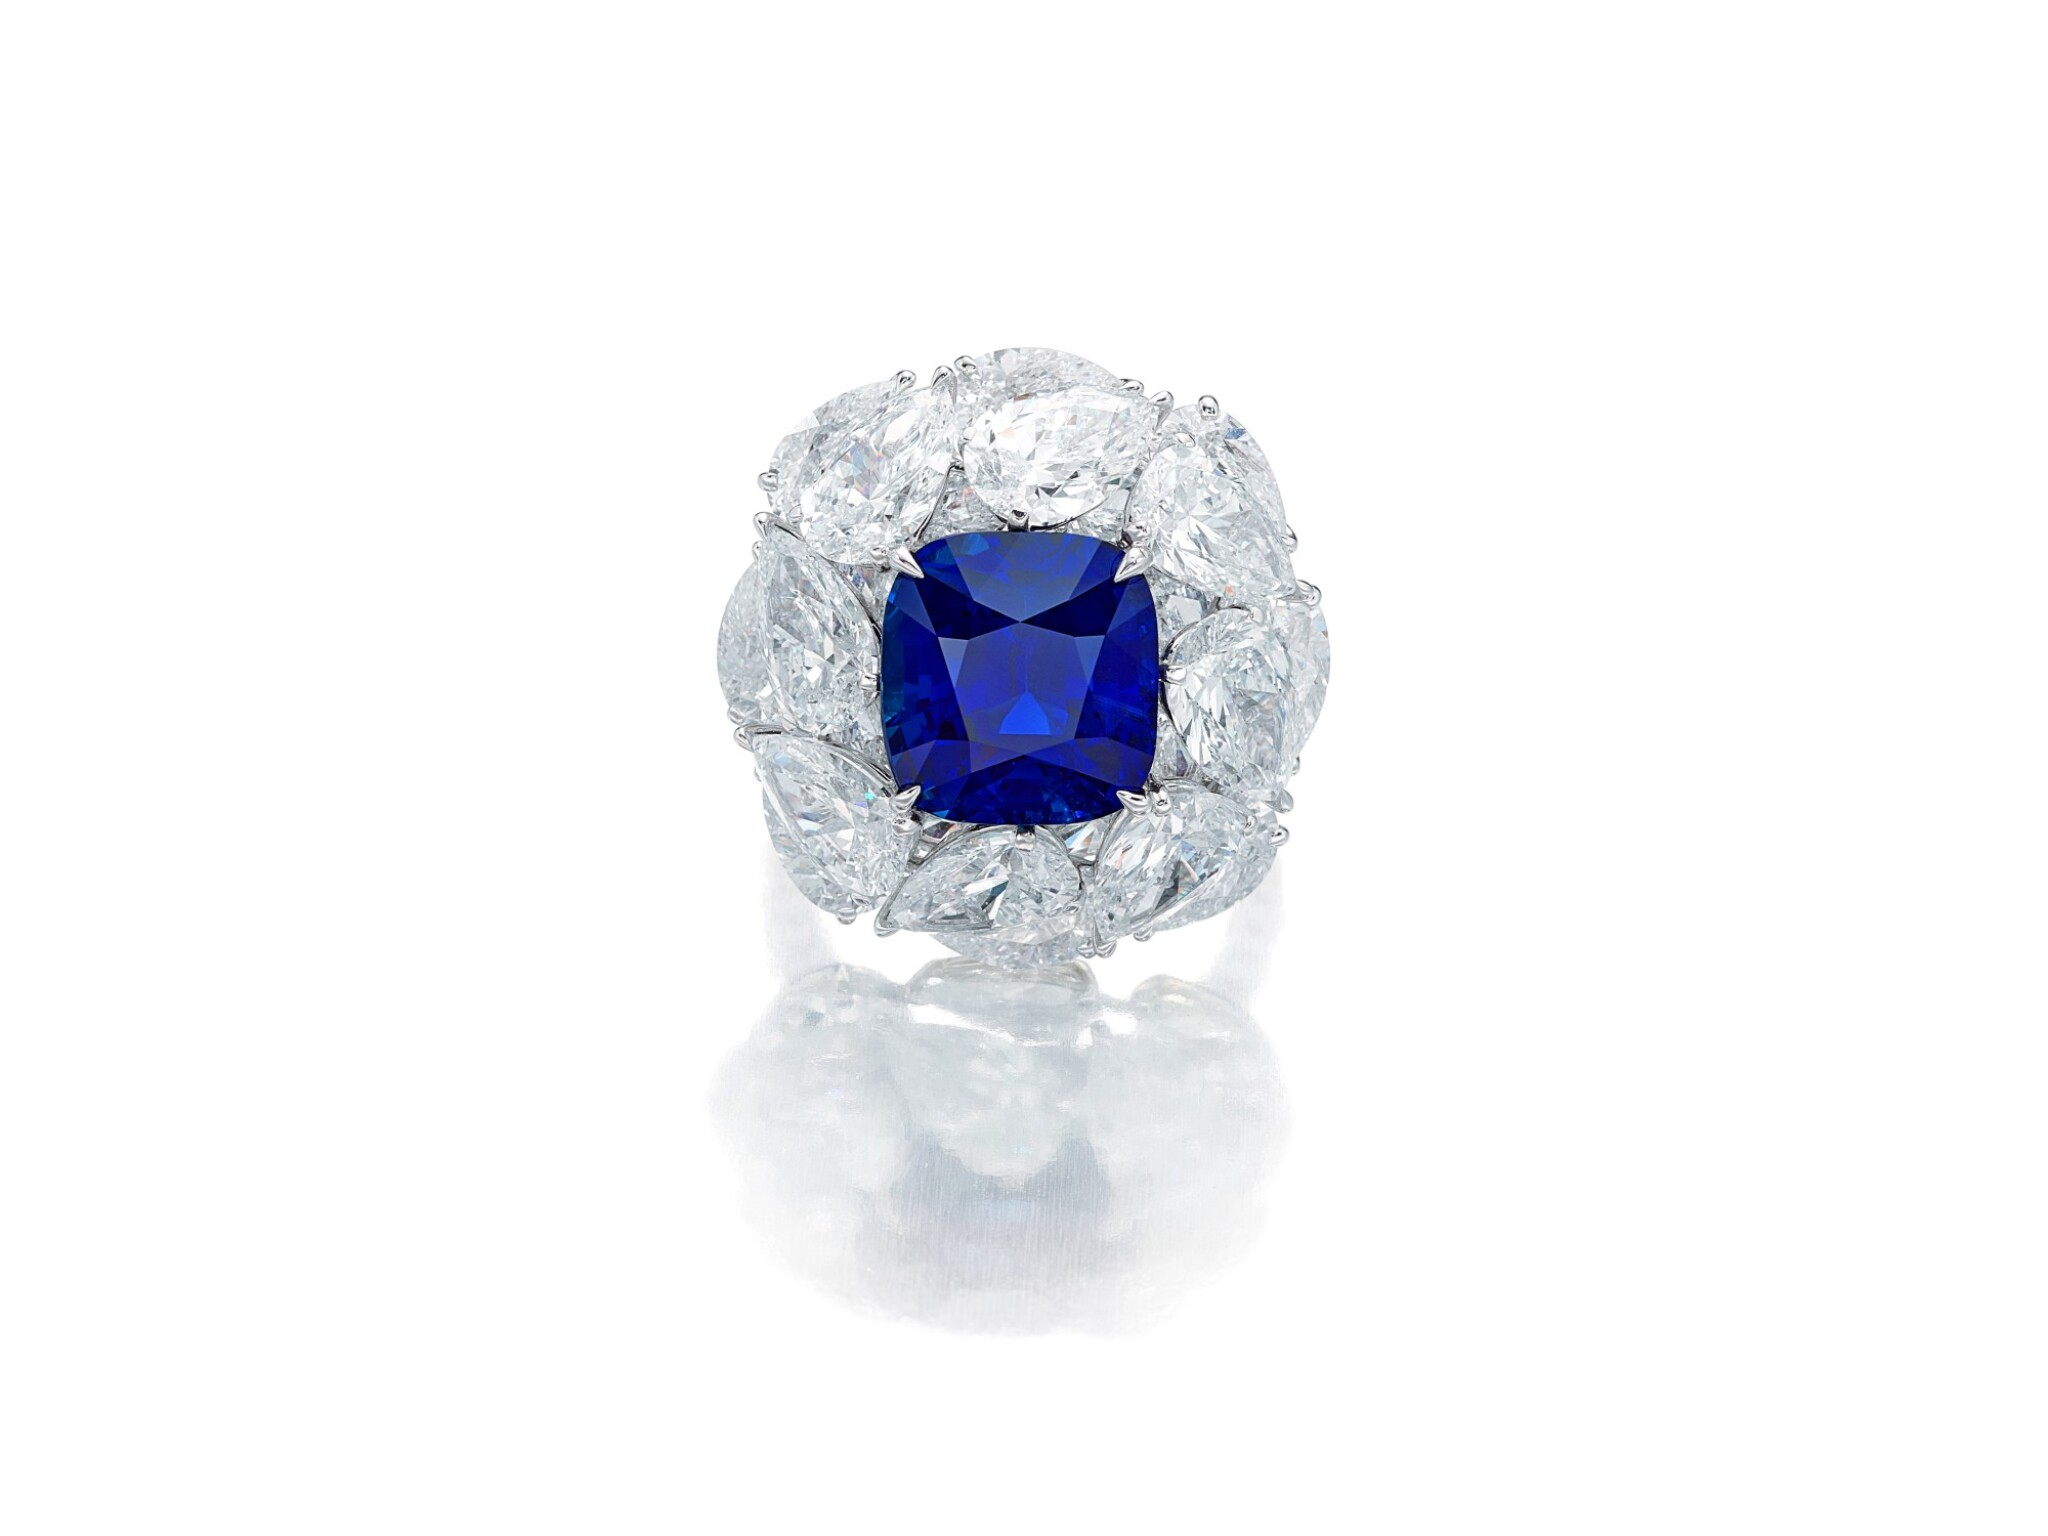 View full screen - View 1 of Lot 1731. Sapphire and Diamond Ring   9.56克拉 天然「緬甸皇家藍」藍寶石 配 鑽石 戒指(鑽石共重約13.44克拉).